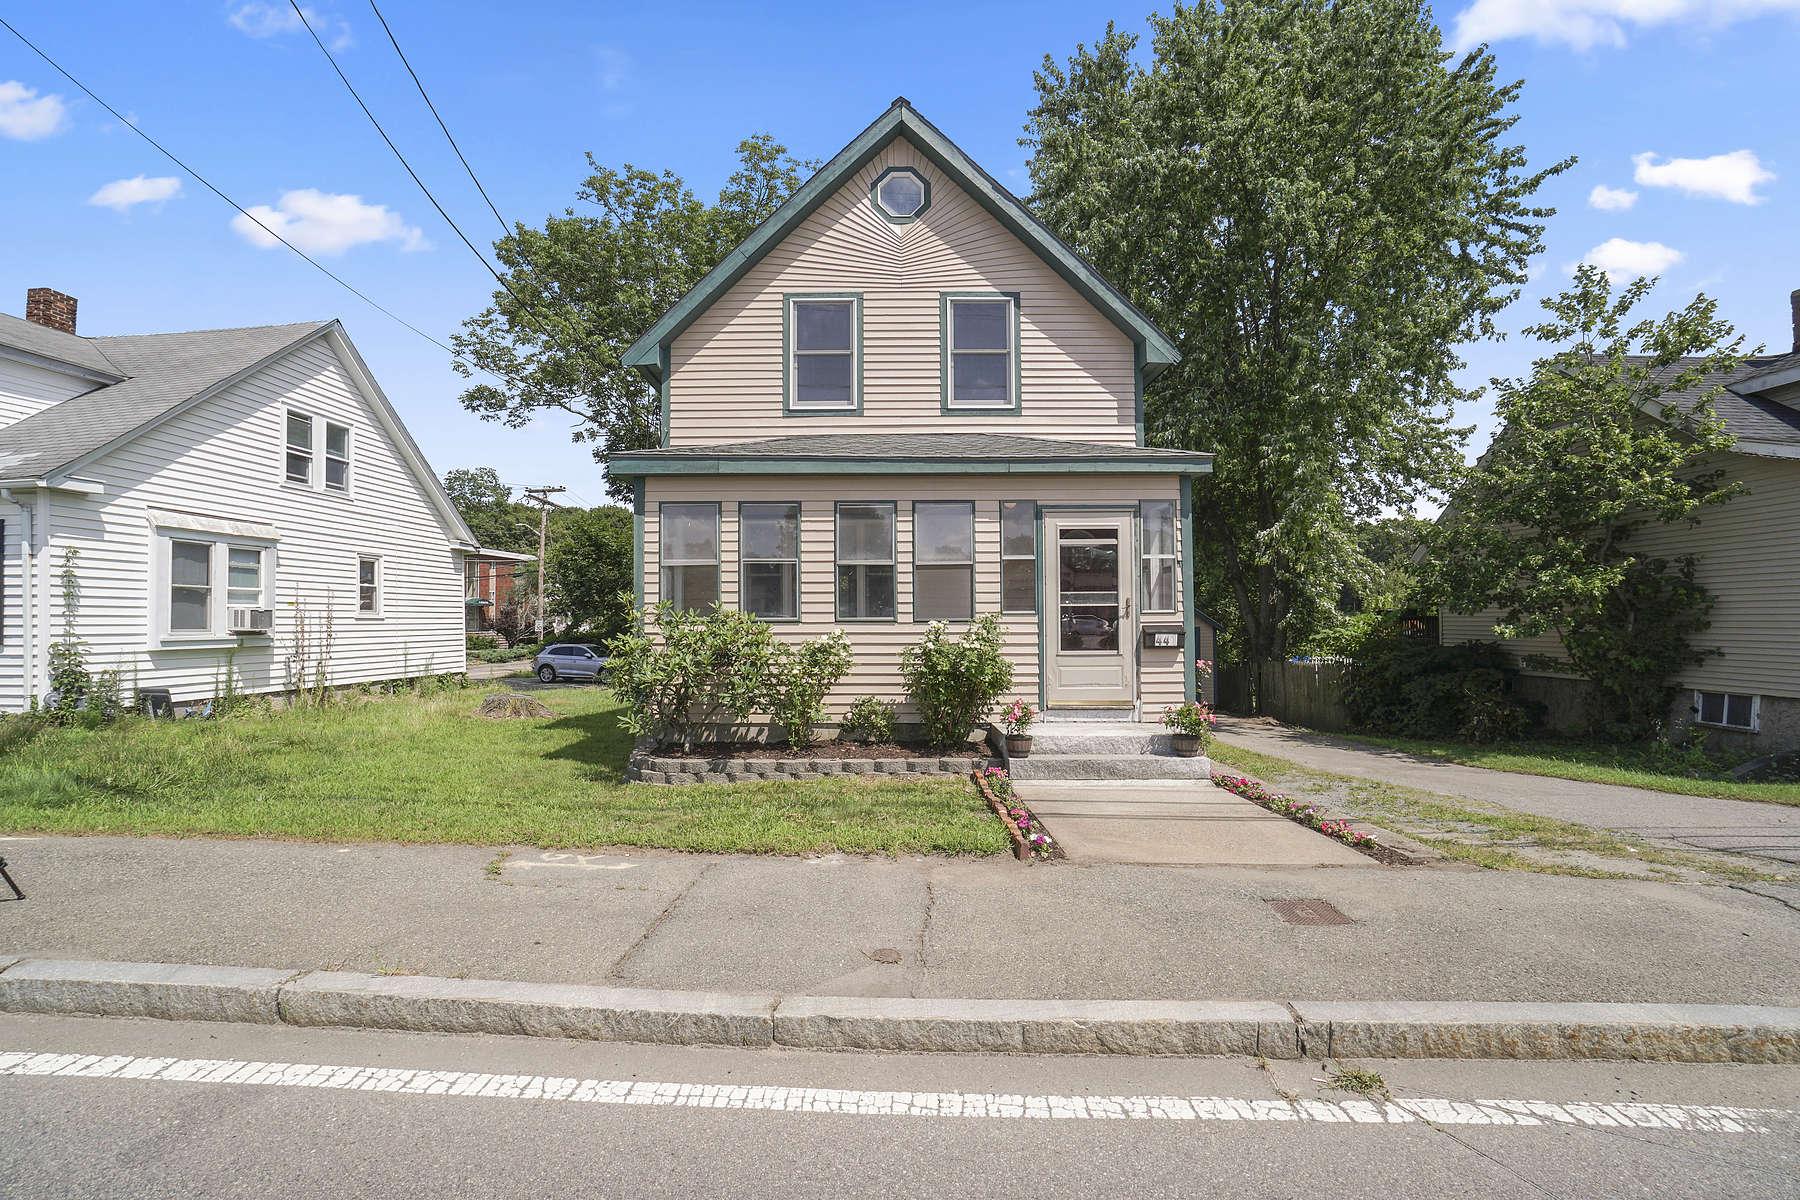 Single Family Homes for Sale at 441 N Franklin St Holbrook, Massachusetts 02343 United States